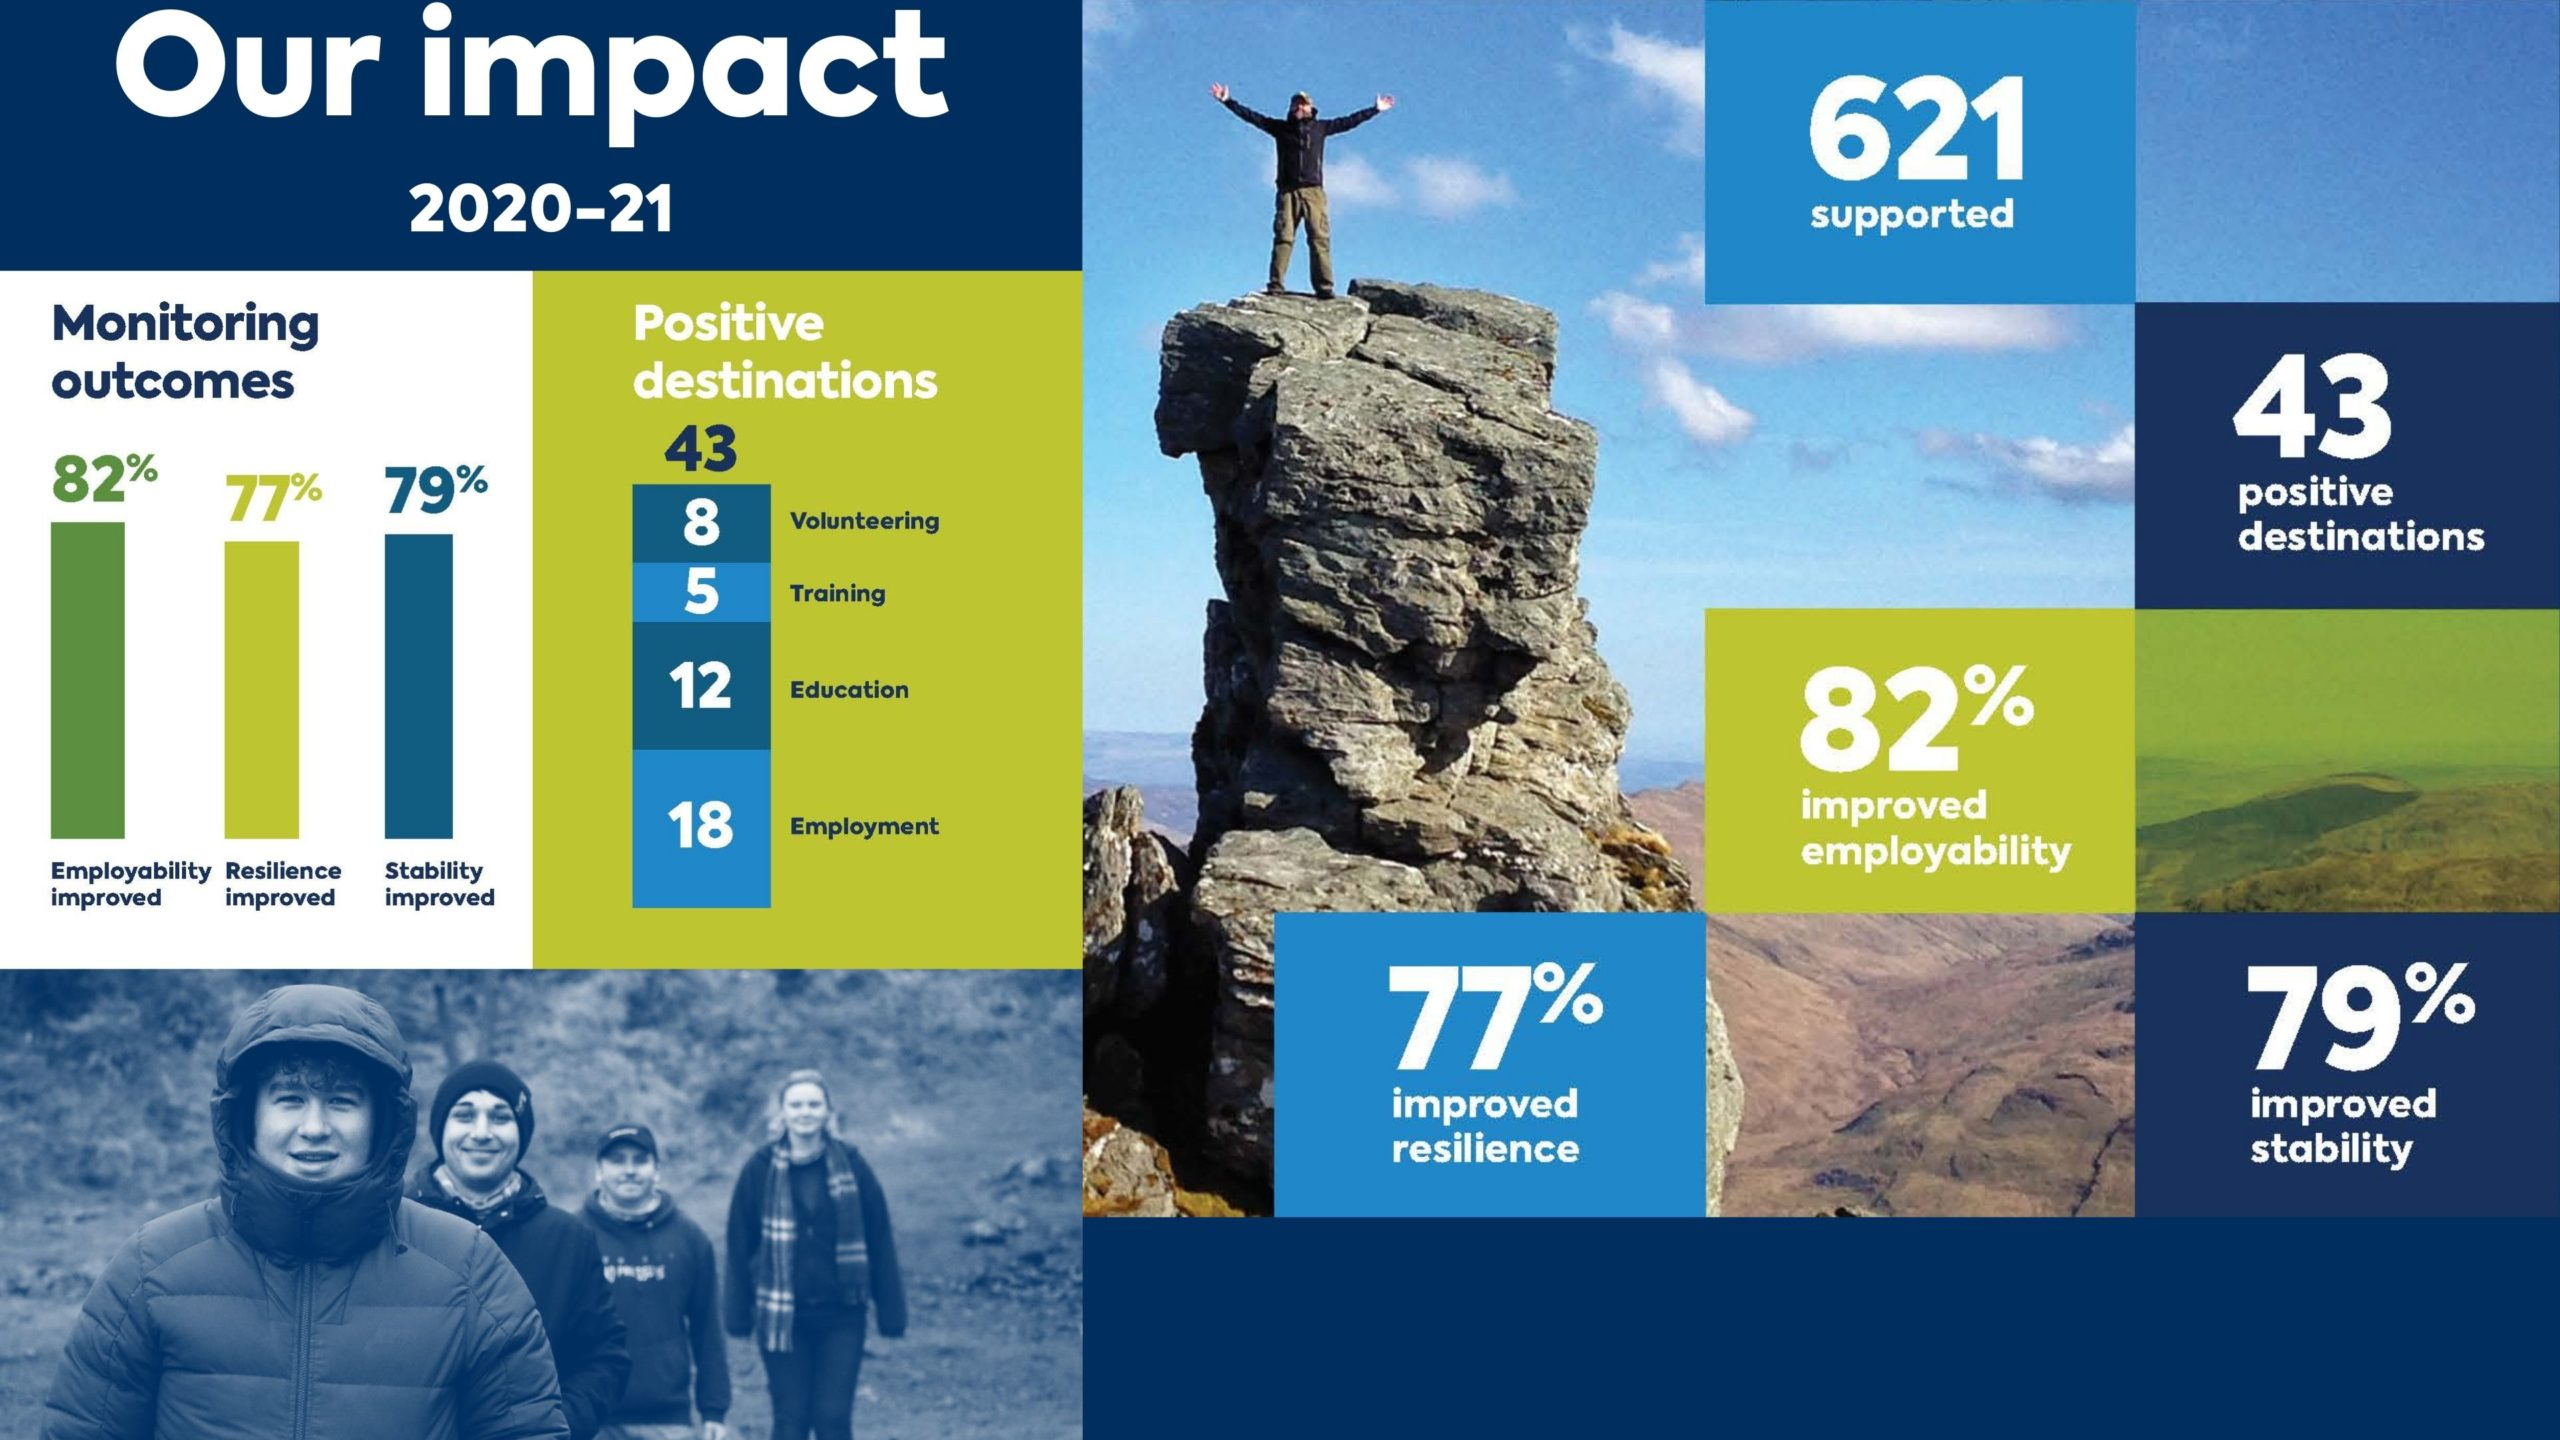 Impact slides 2020-21